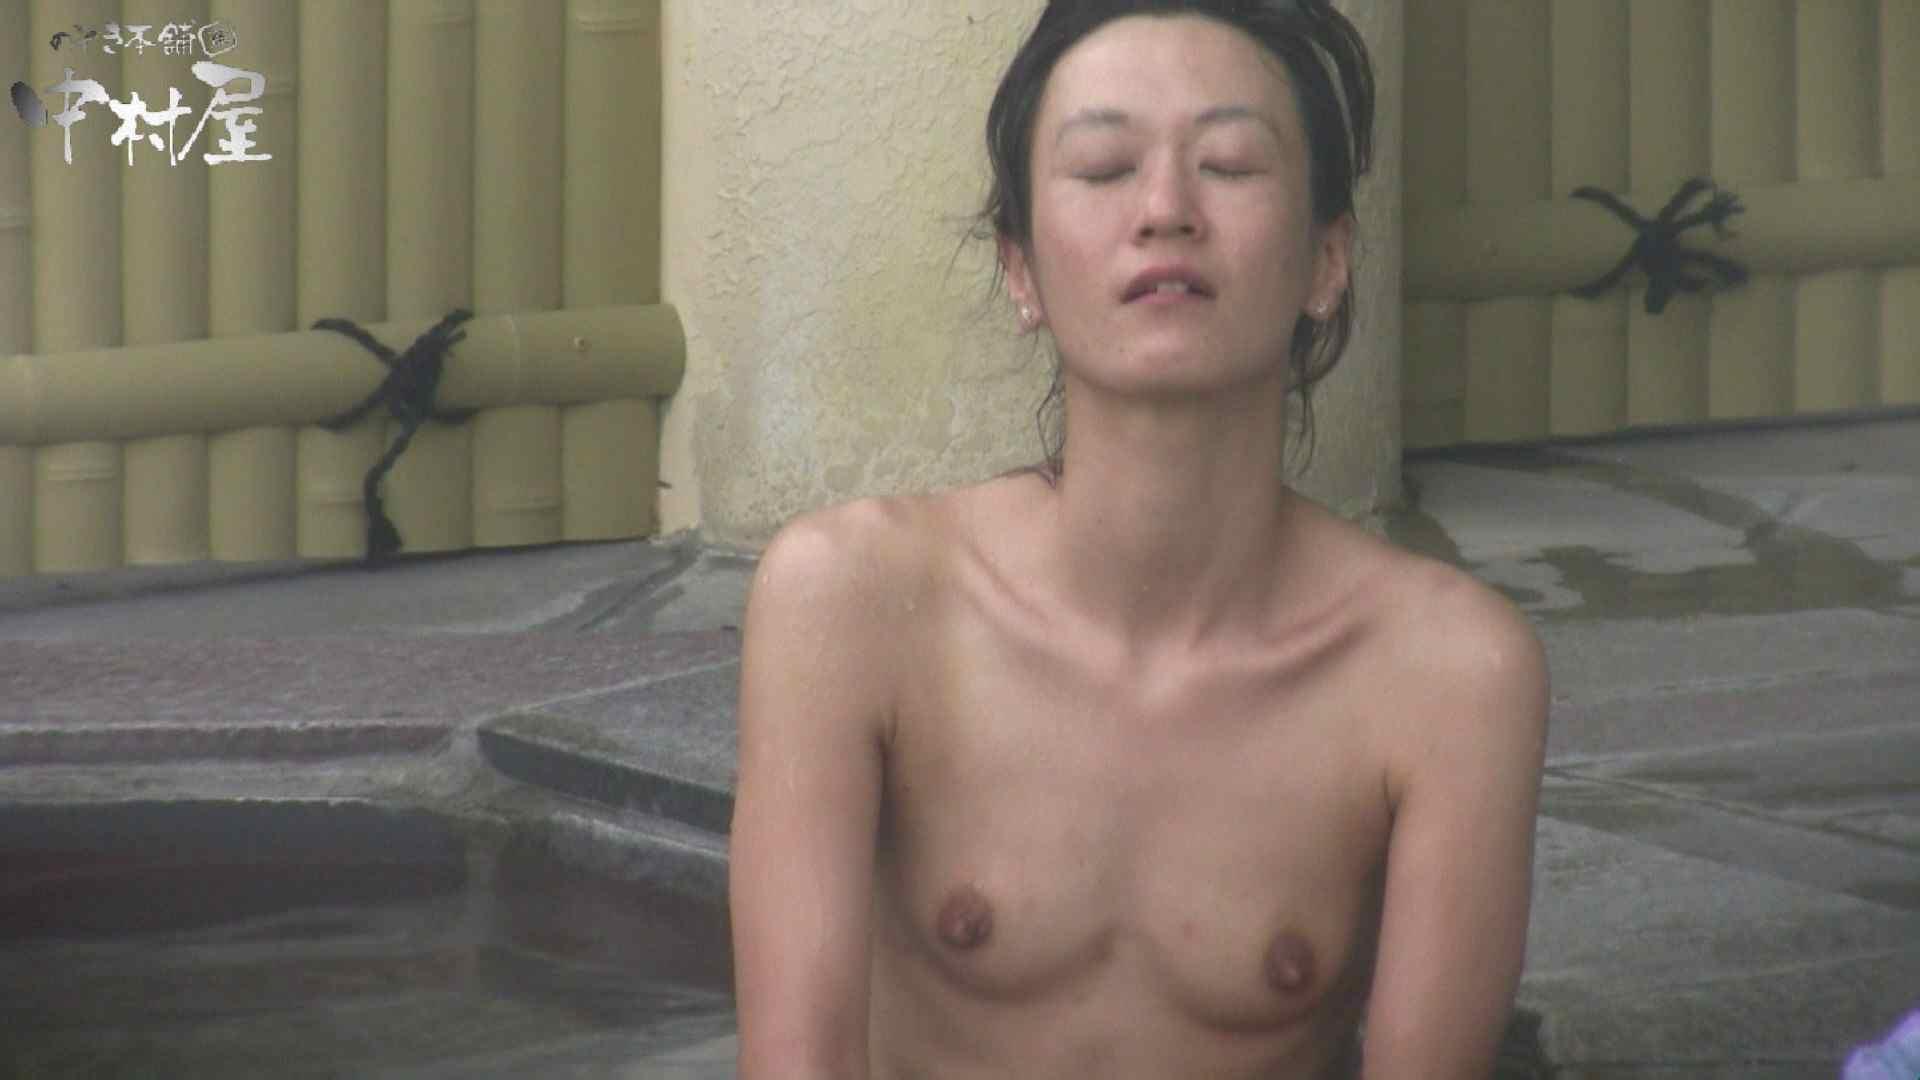 Aquaな露天風呂Vol.928 OLセックス  99画像 57